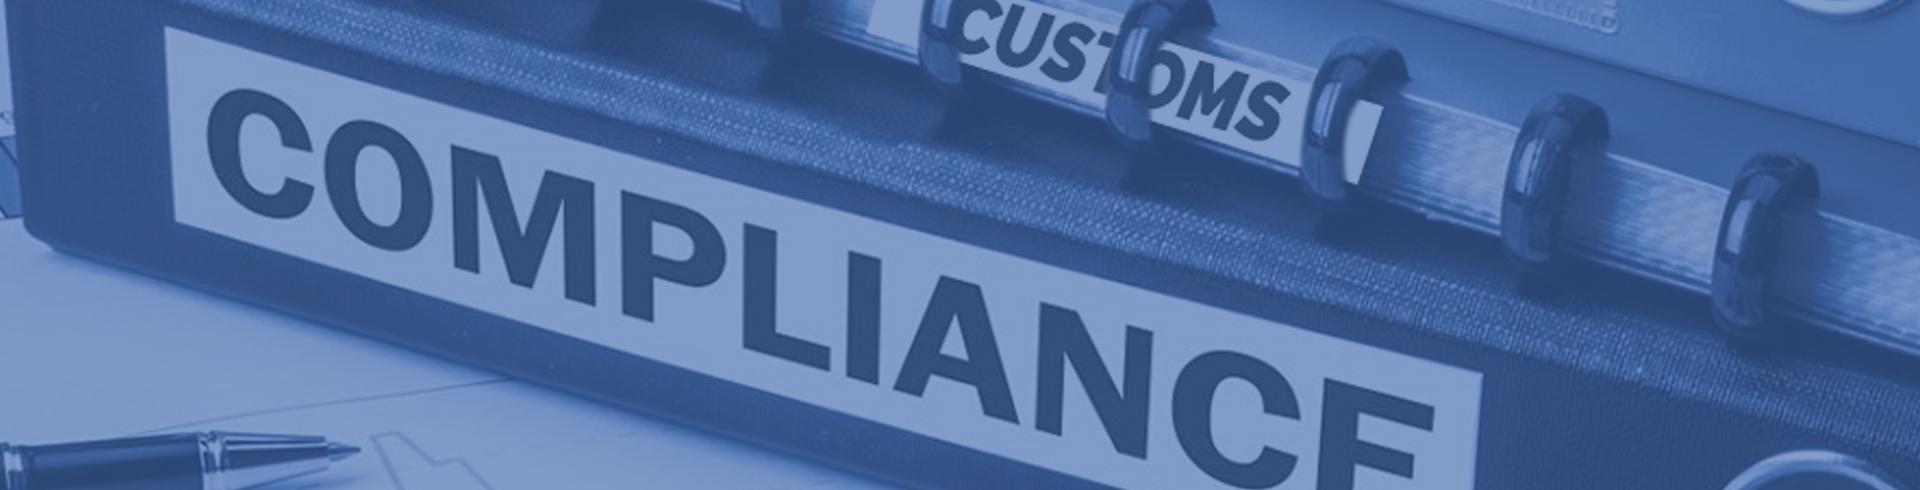 Customs%20compliance%20 %20banner